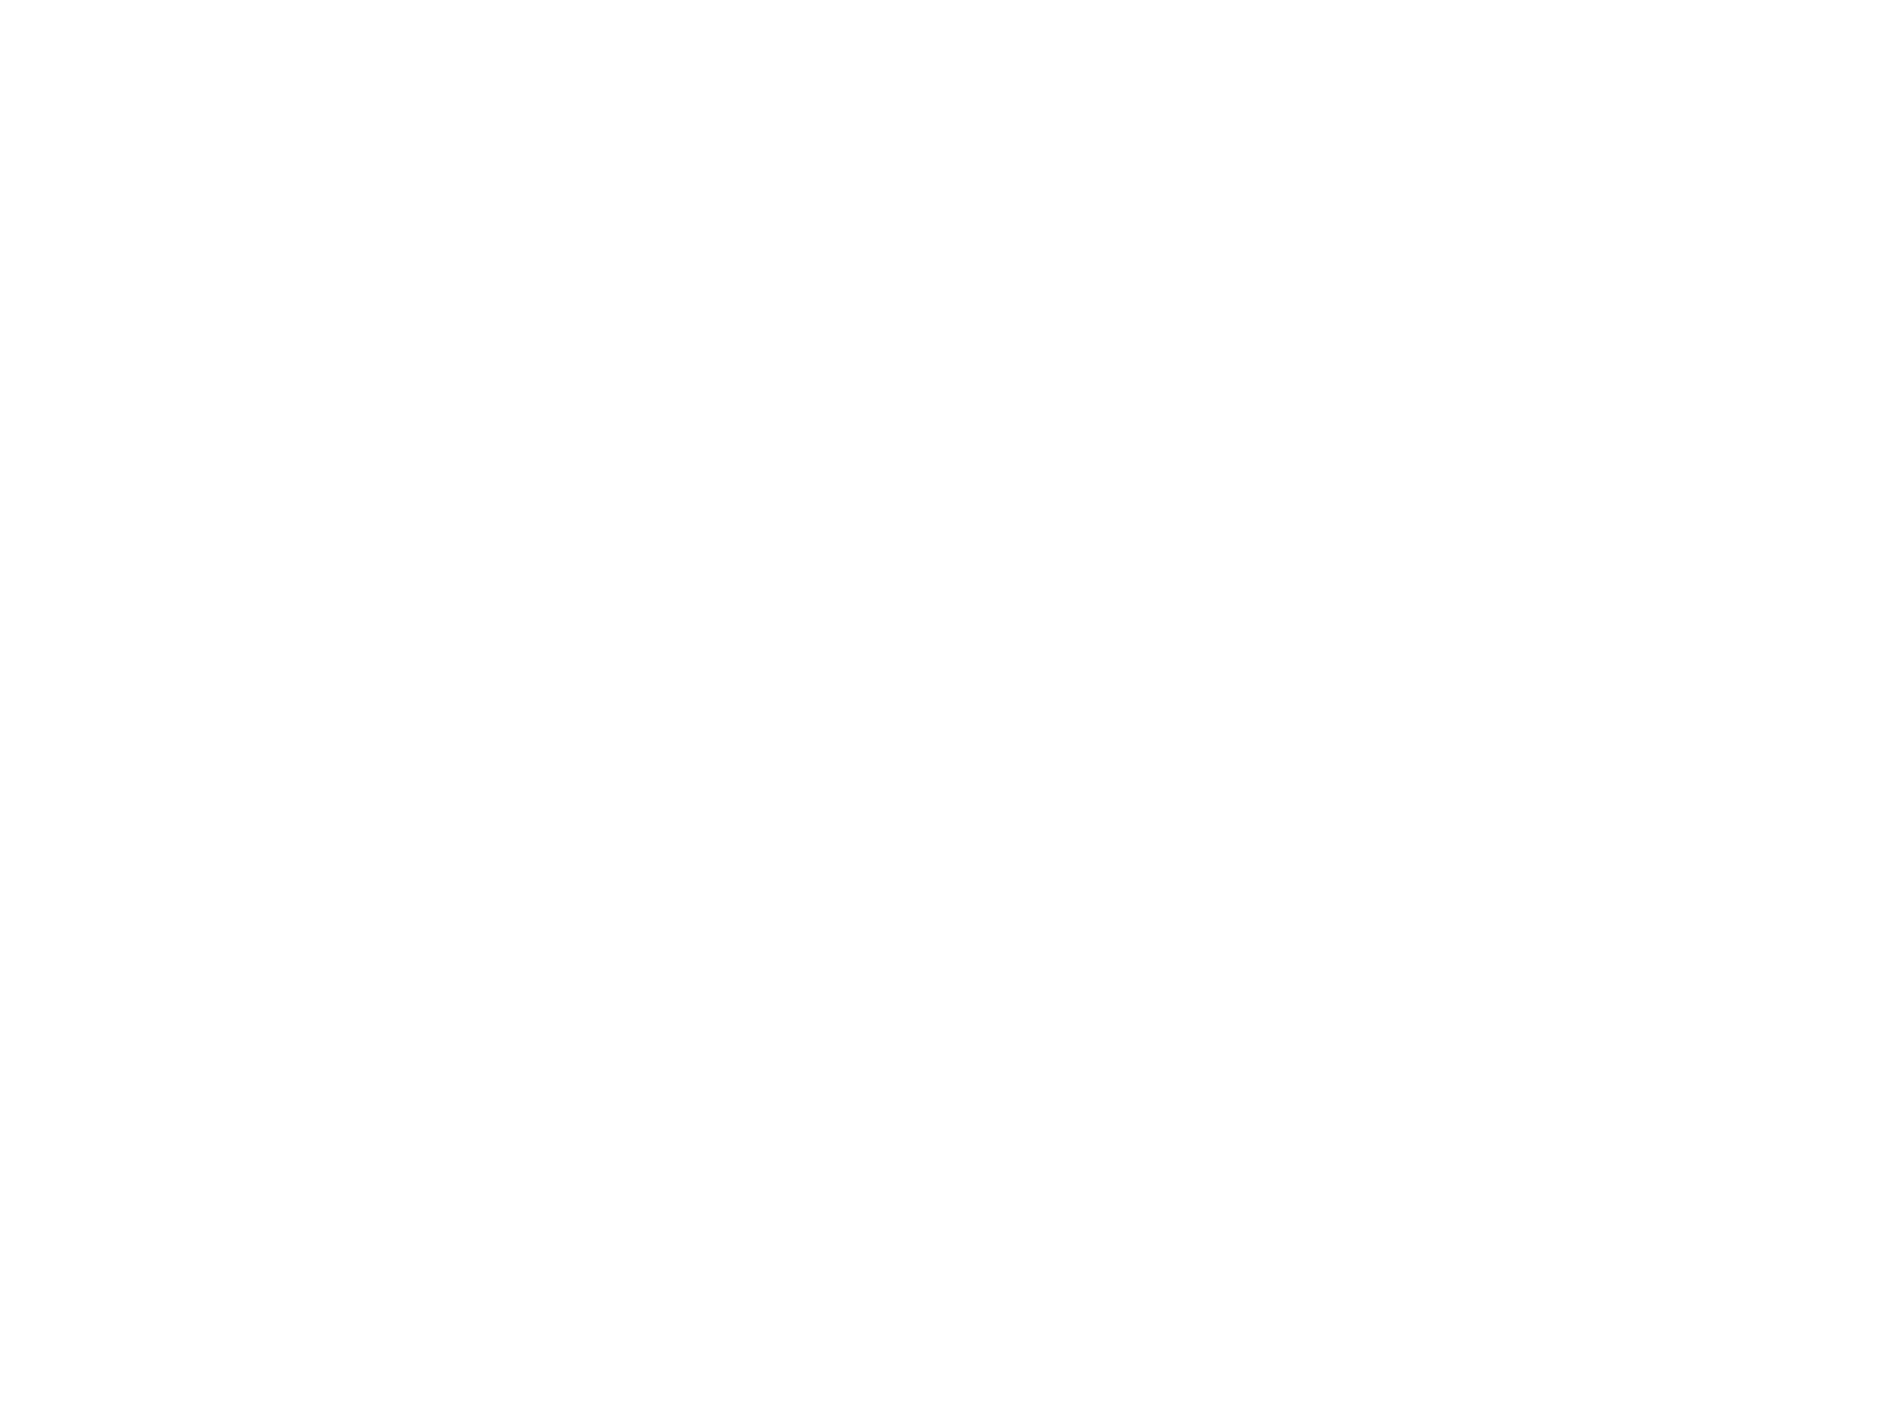 kritMed Leipzig